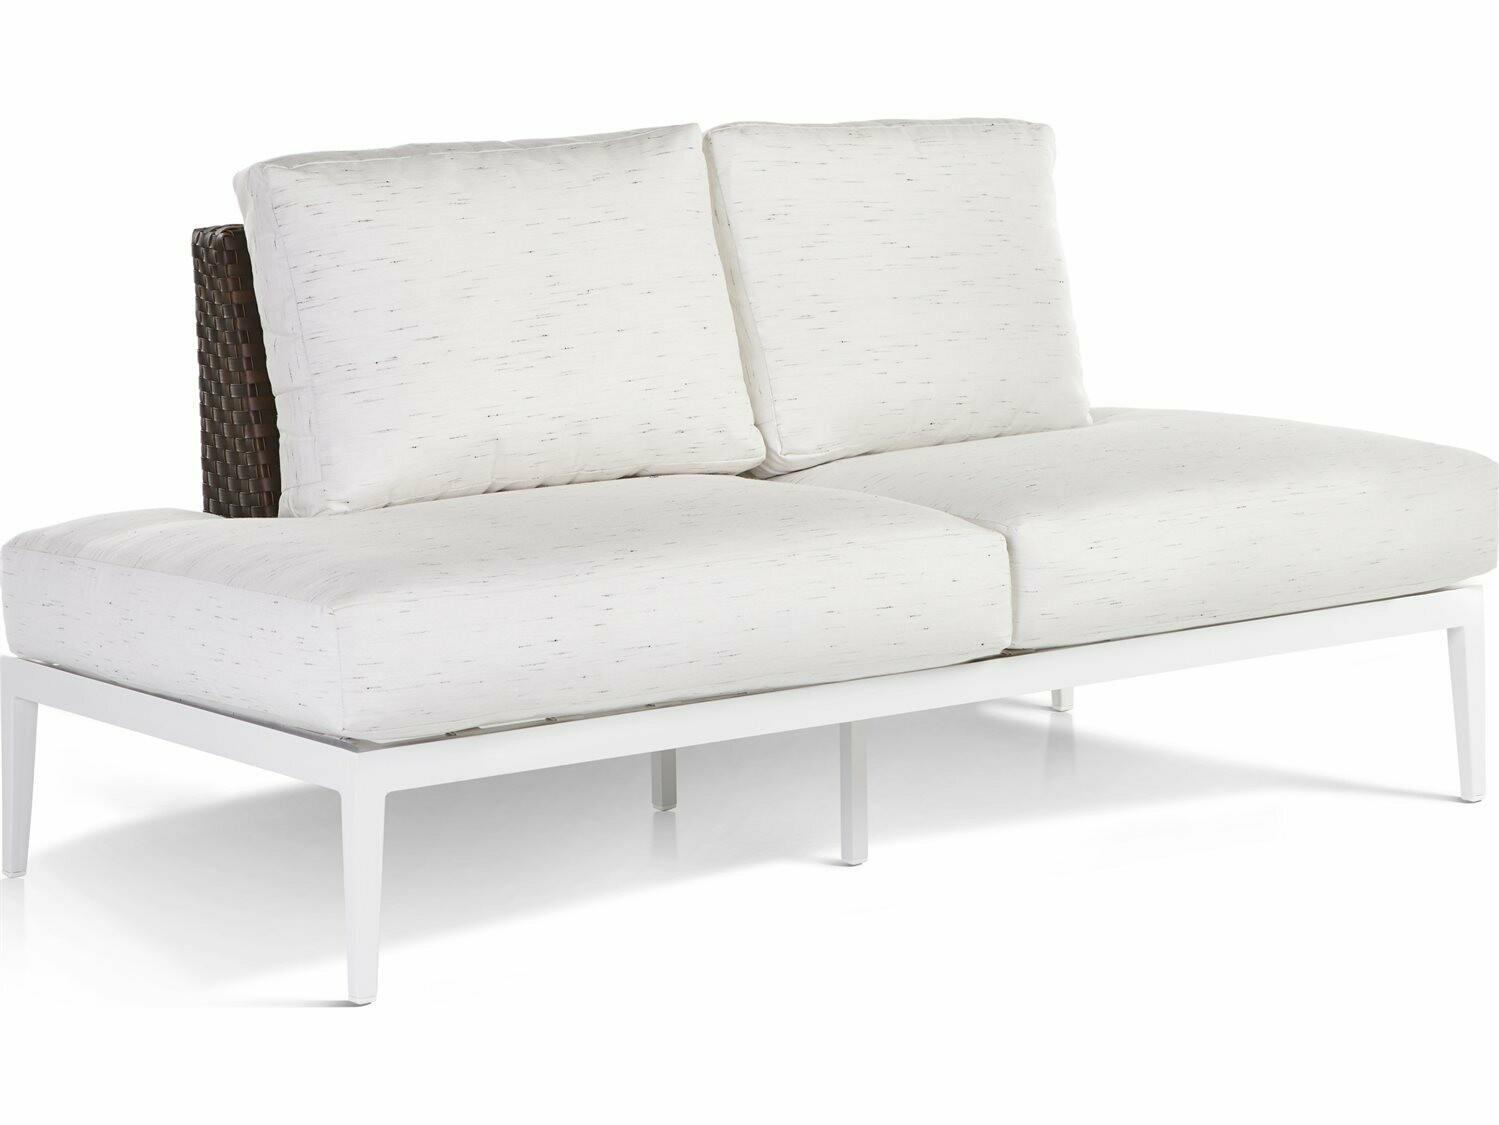 South Sea Rattan Stevie Wicker Modular Loveseat with Wrap Around Cushions